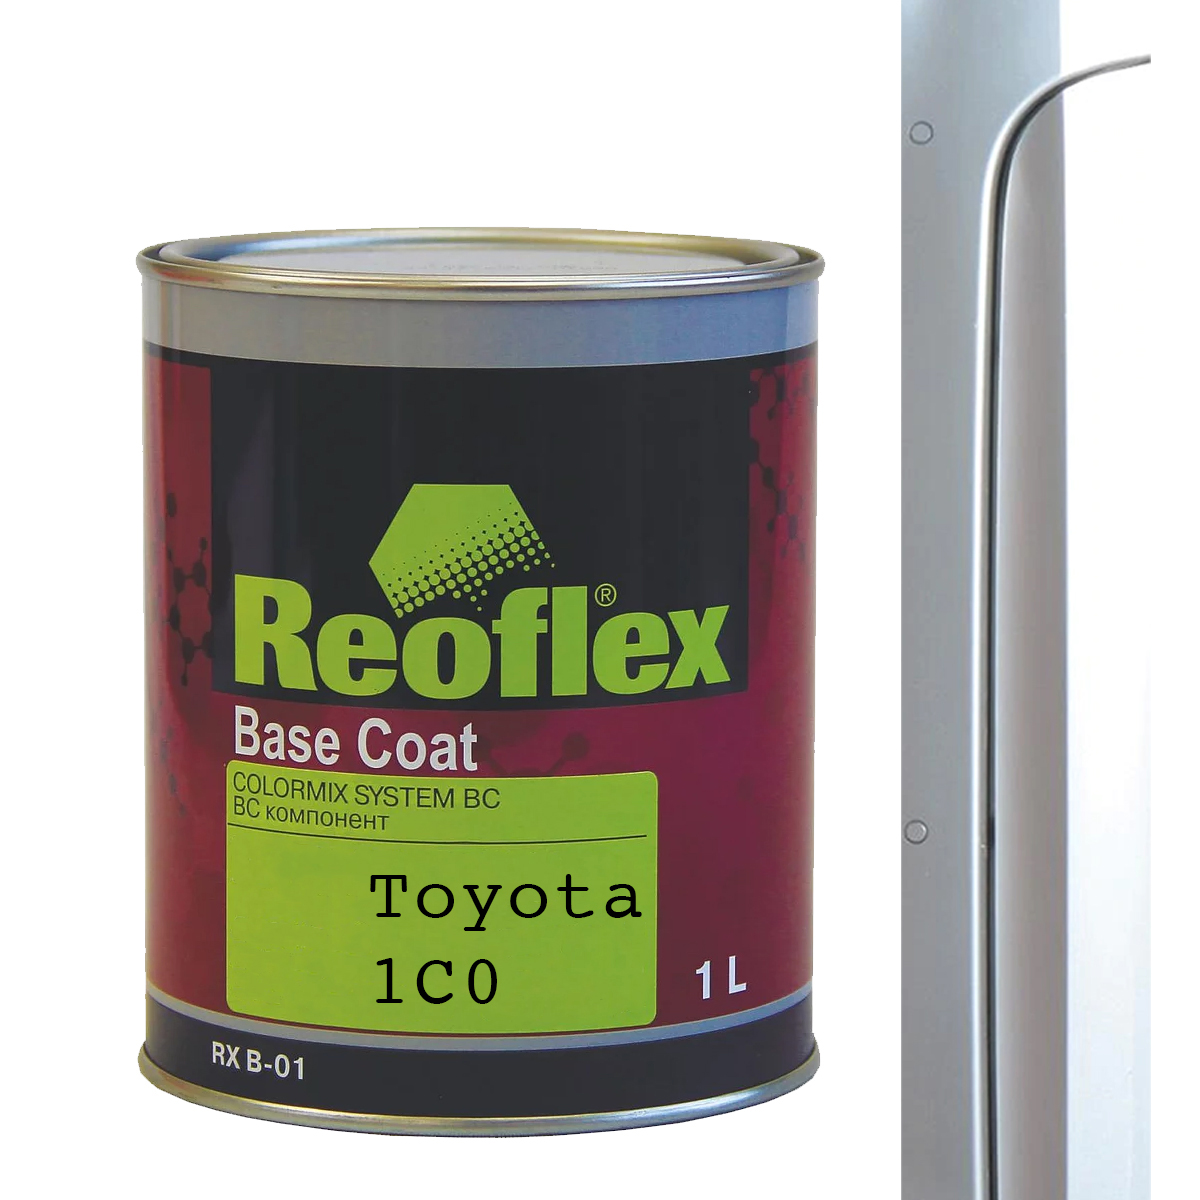 Reoflex Toyota 1C0